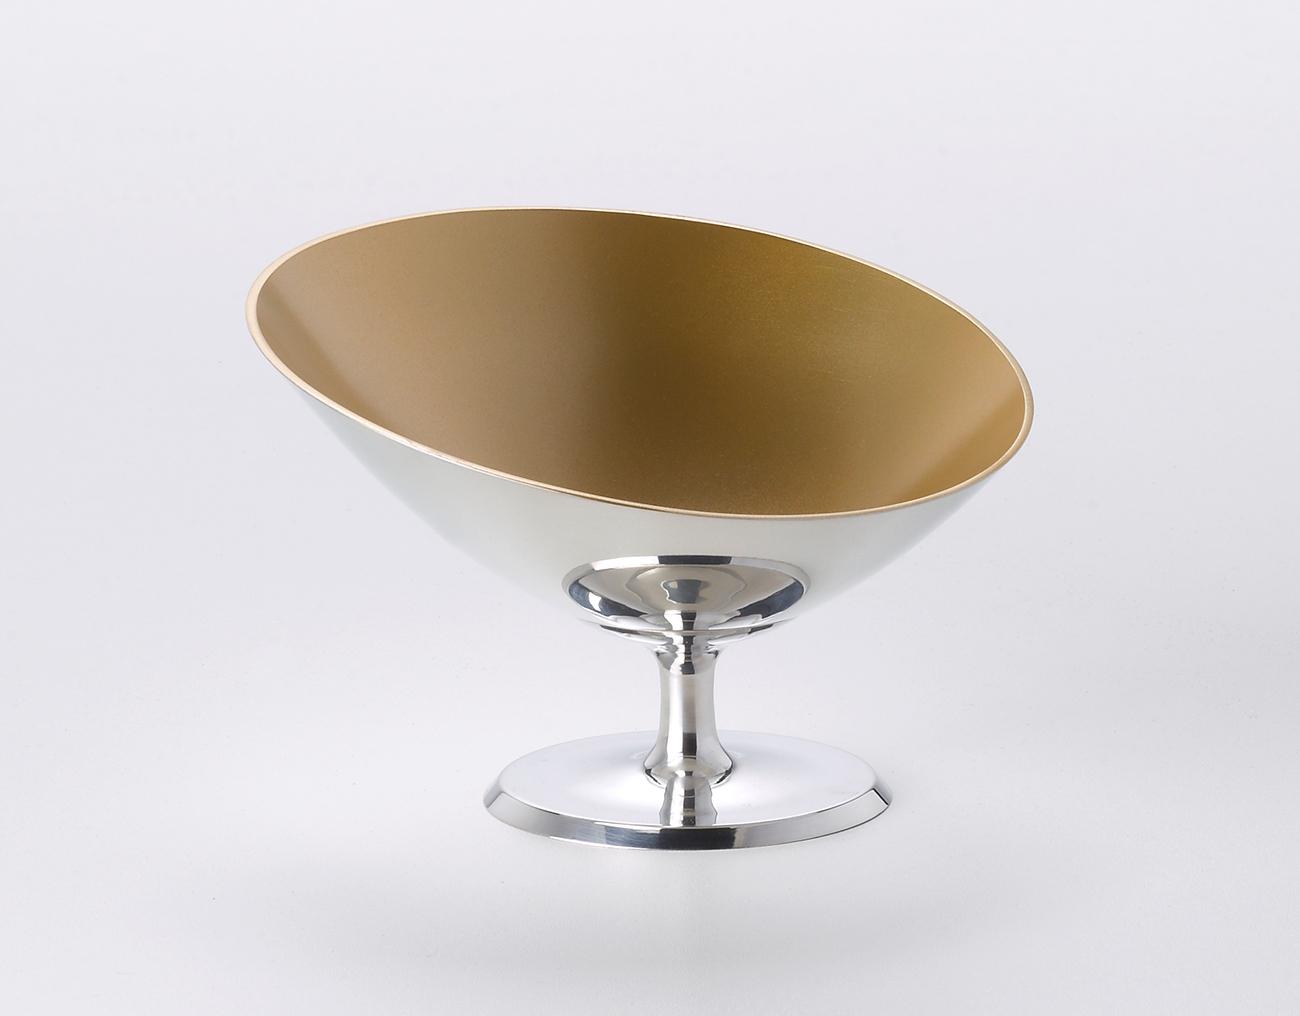 OA1710-seau-à-champagne-design-produit-agence-planet-design-eric-berthes03.jpg